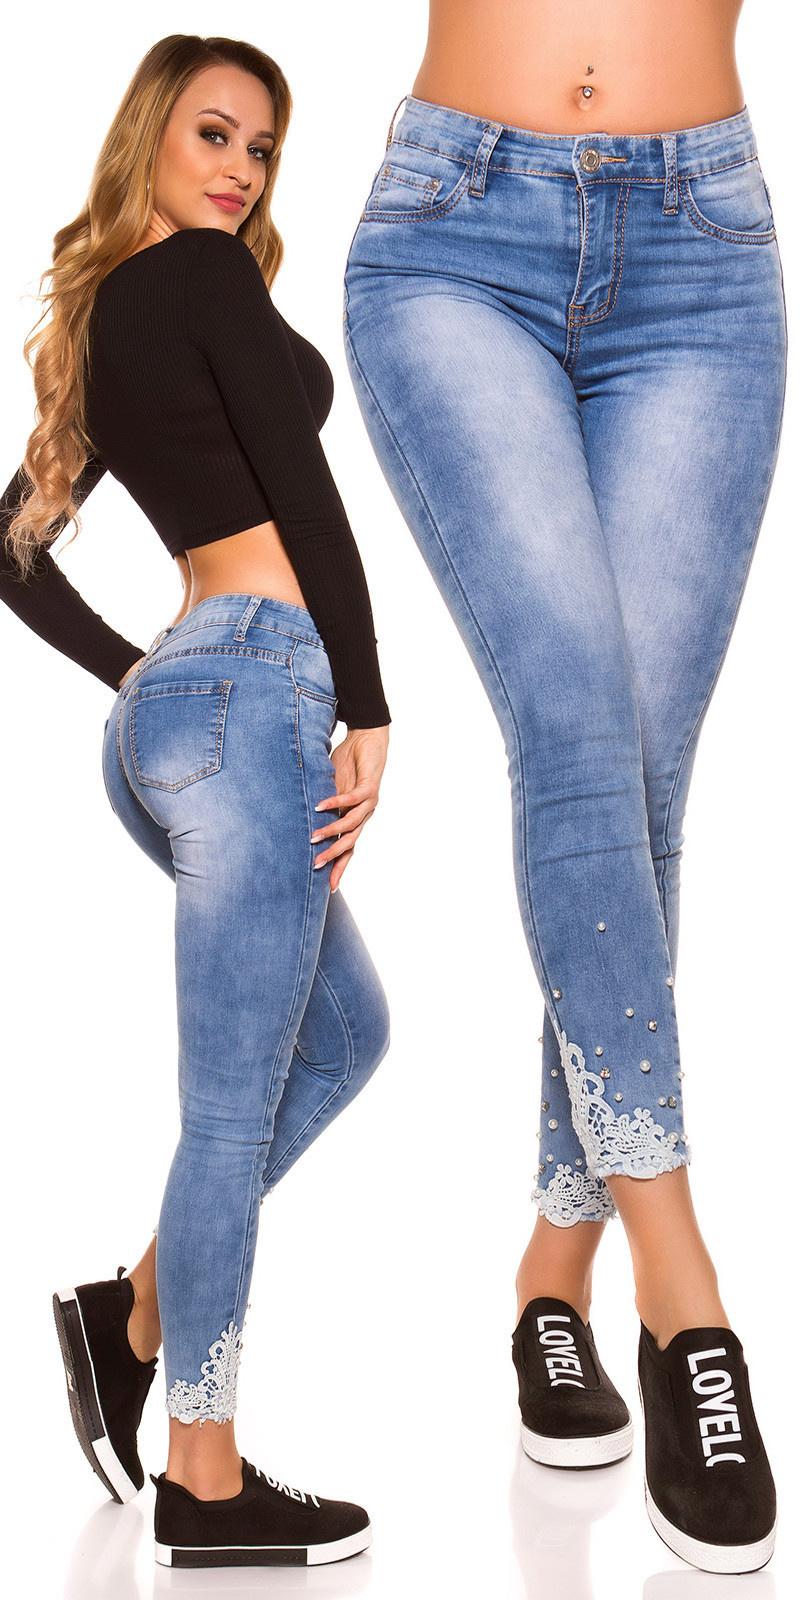 Sexy High Waist Skinny Jeans w. Lace, rhinestones Jeansblue